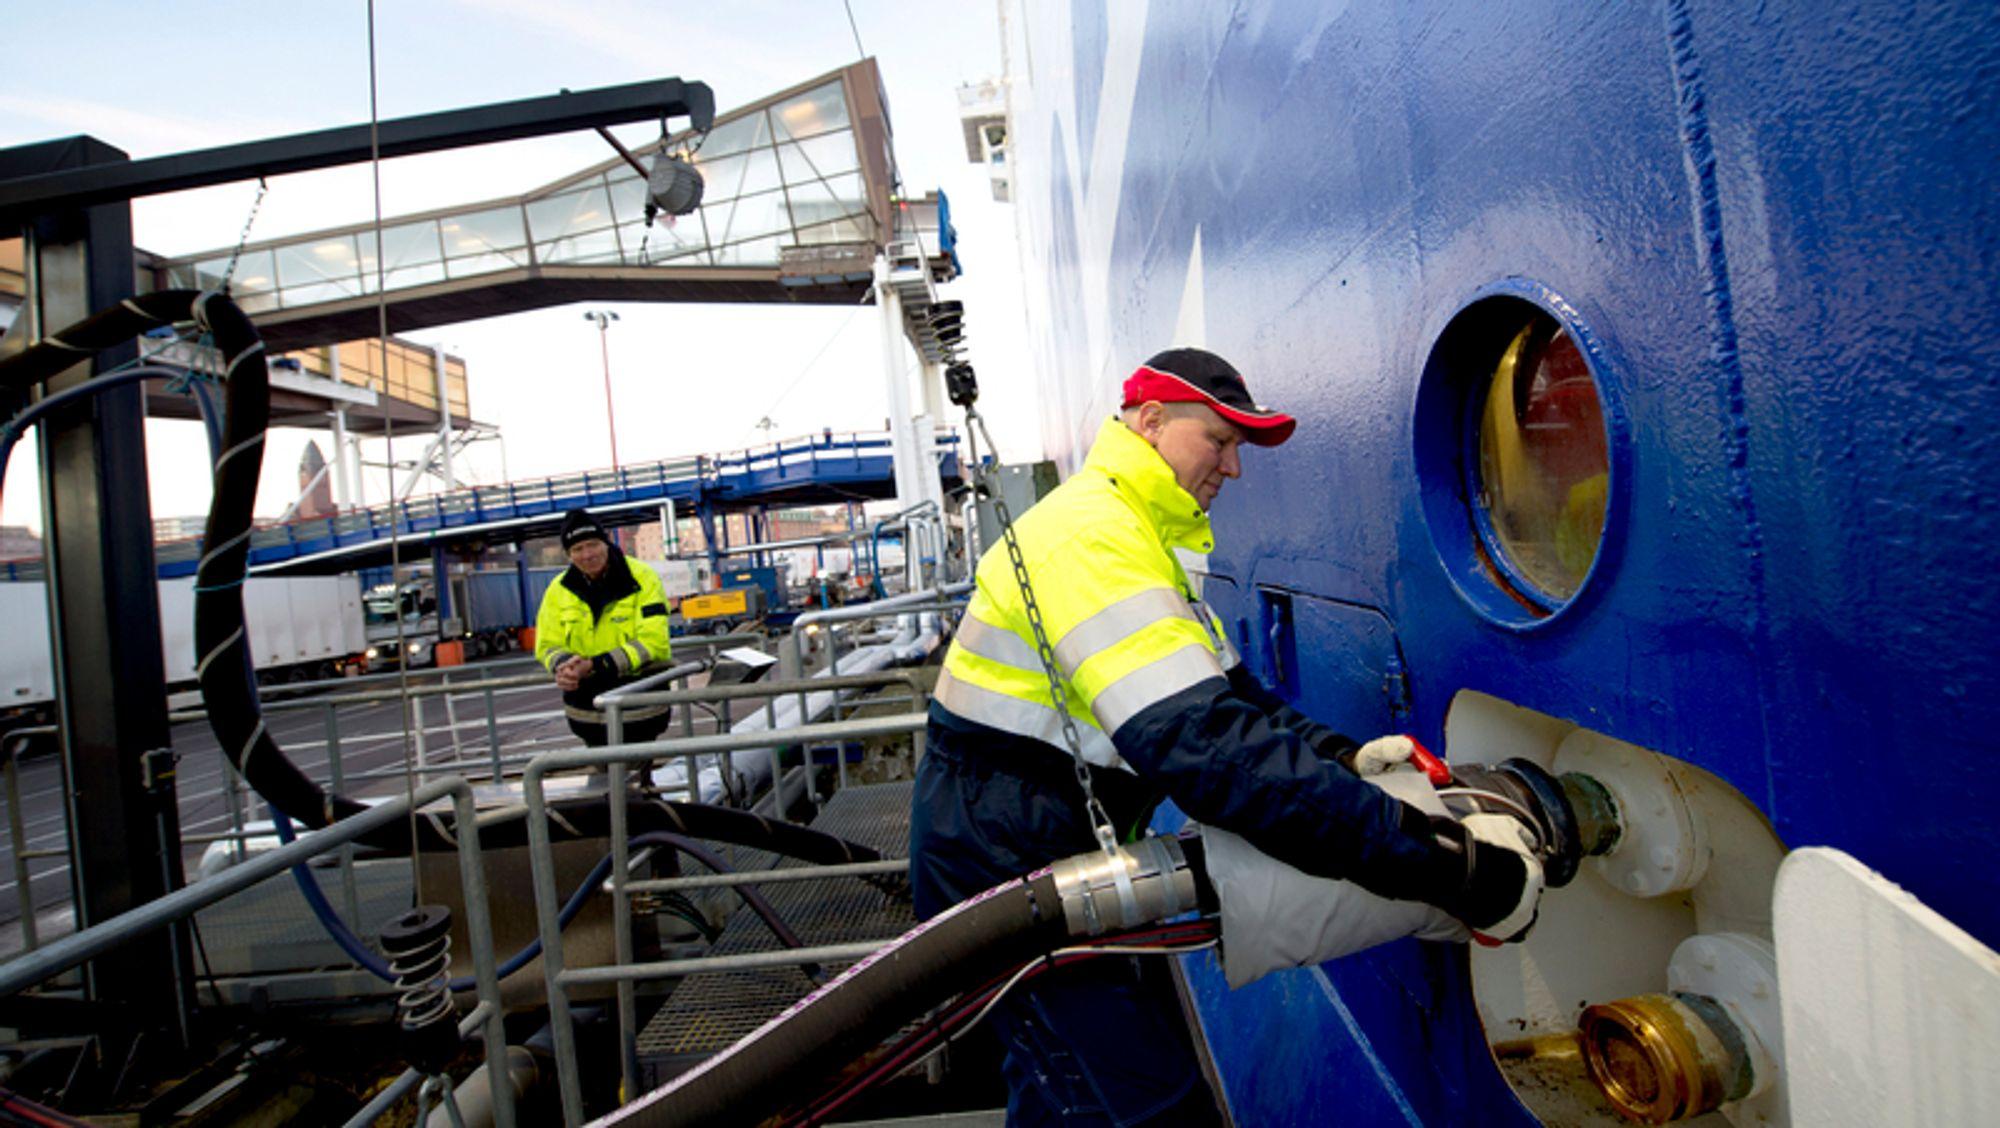 Den svenske bil -og passasjerferga «Stena Danica» kobles på fjernvarme ved havna i Göteborg. Flere aktører jobber for å få til det samme ved havner i Norge. I Bodø ser de på fjernvarme til havna i forbindelse et større byutviklingsprosjekt.